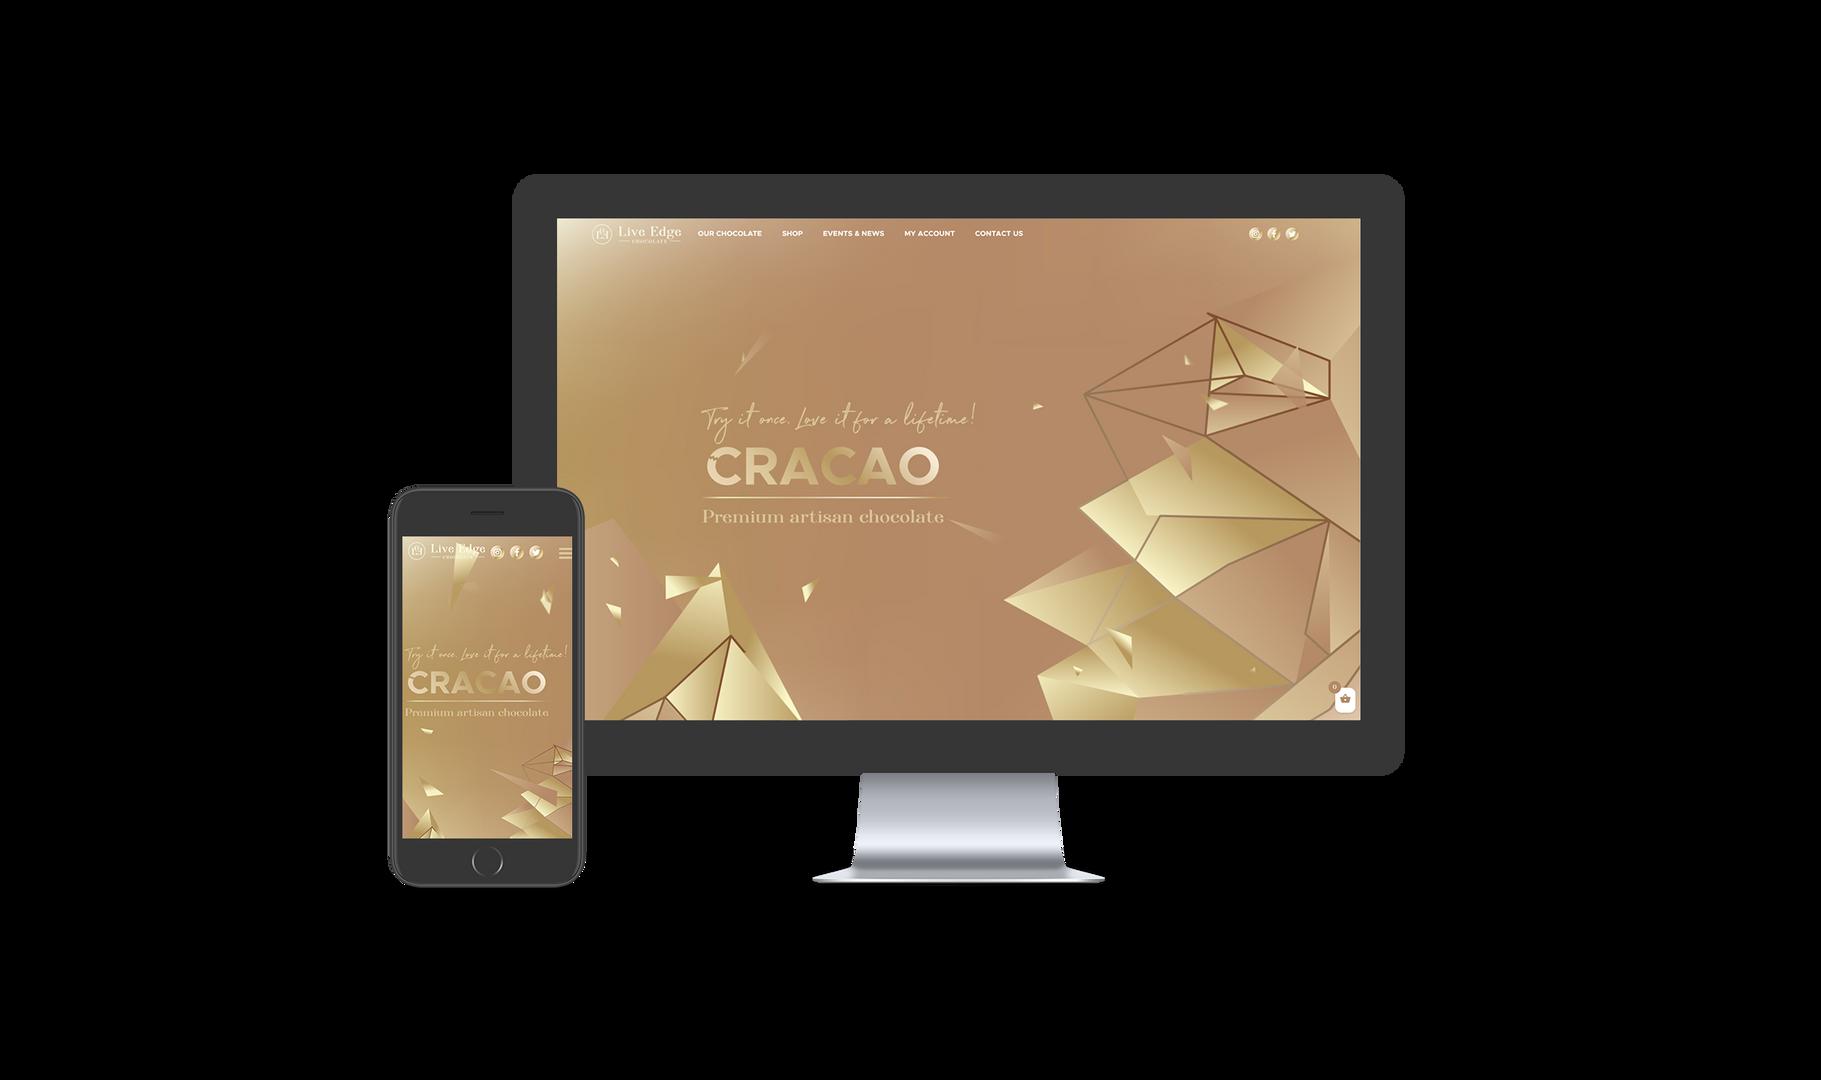 mariyadesign-cracao-webdesign-01.png